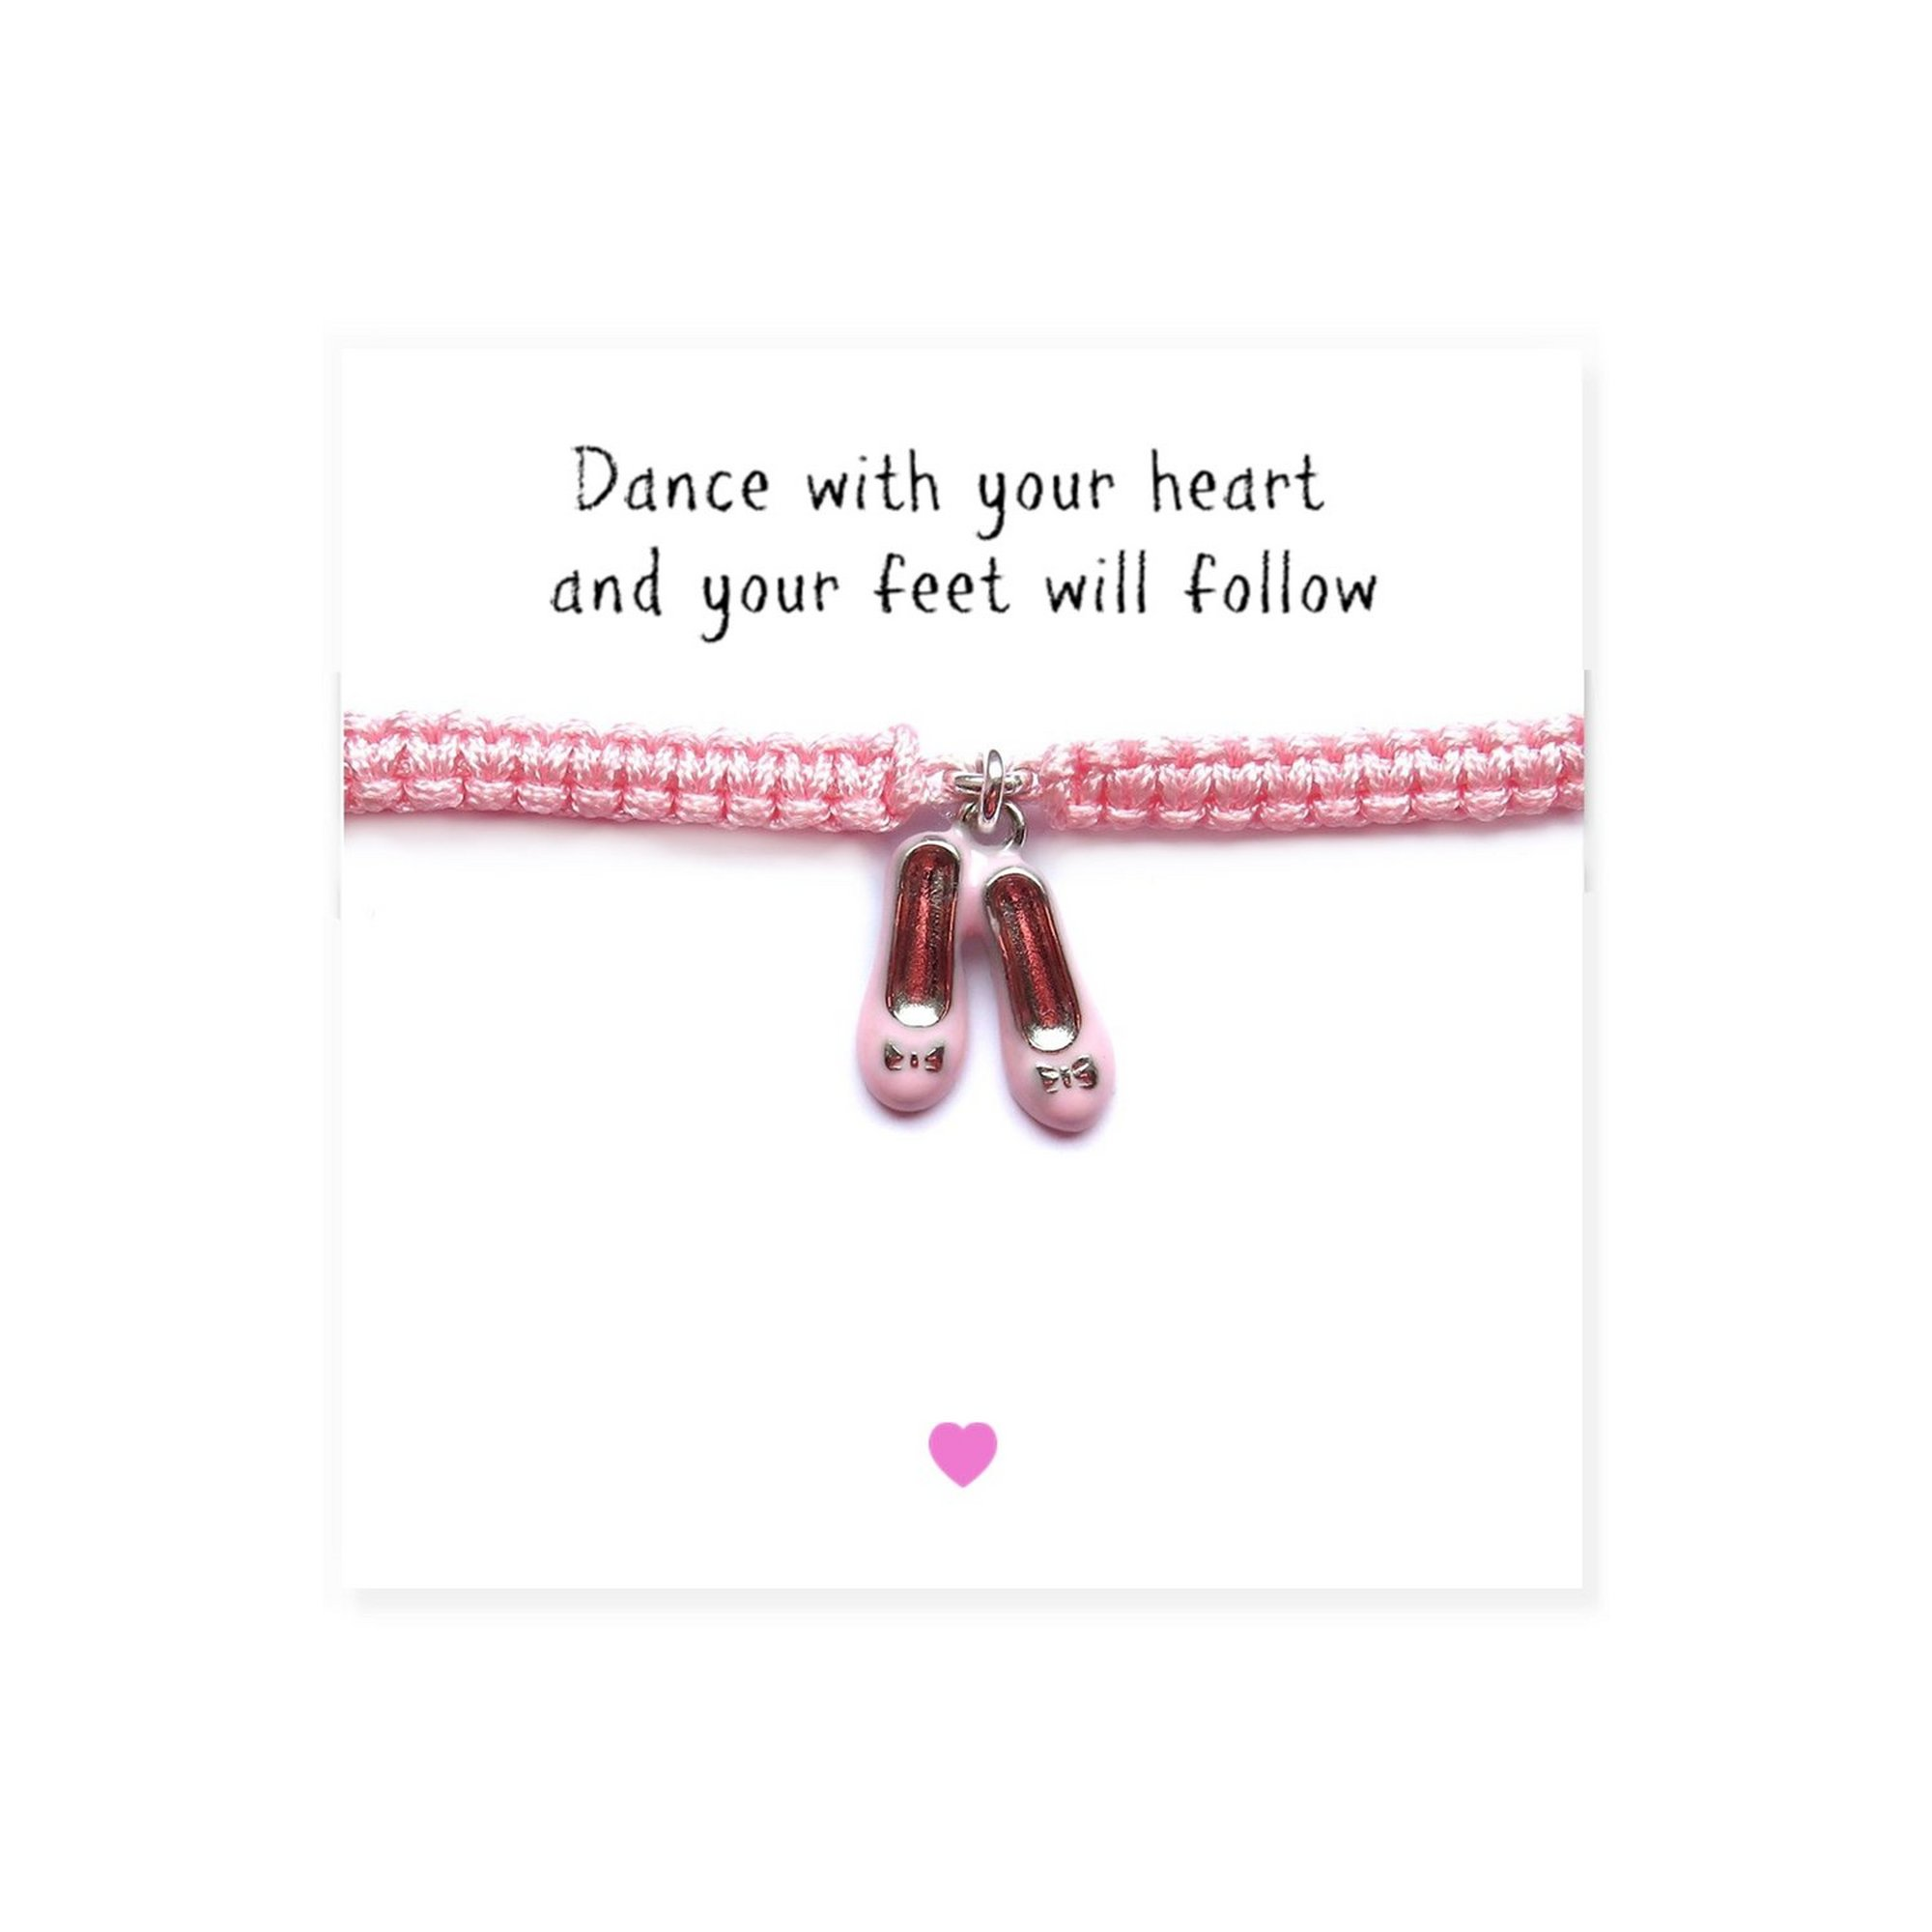 Image of Ballet Shoes Friendship Bracelet and Message Card